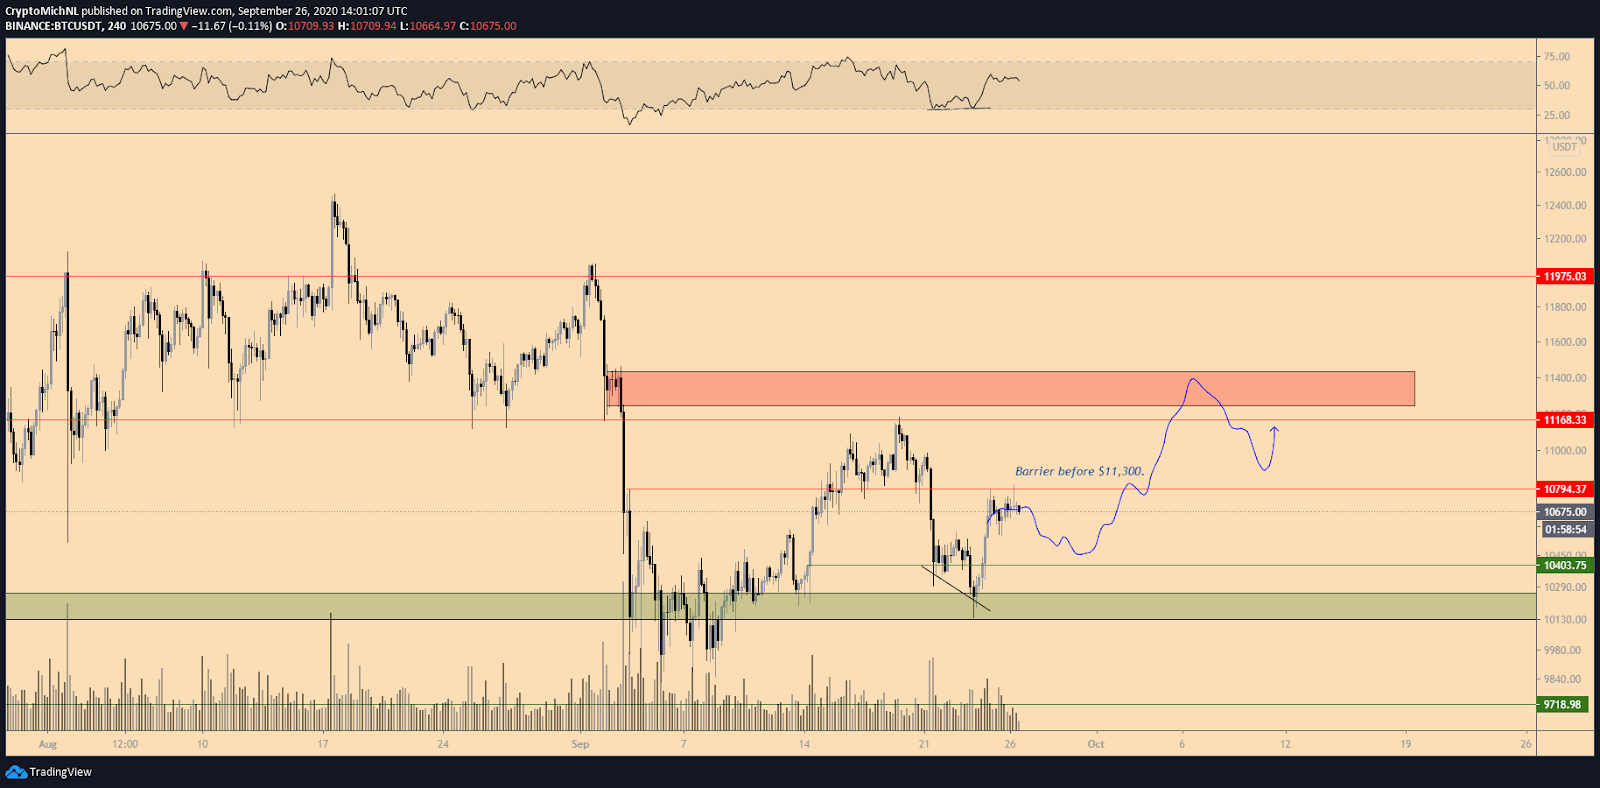 BTC/USD 4-hour chart bullish scenario. Source: TradingView